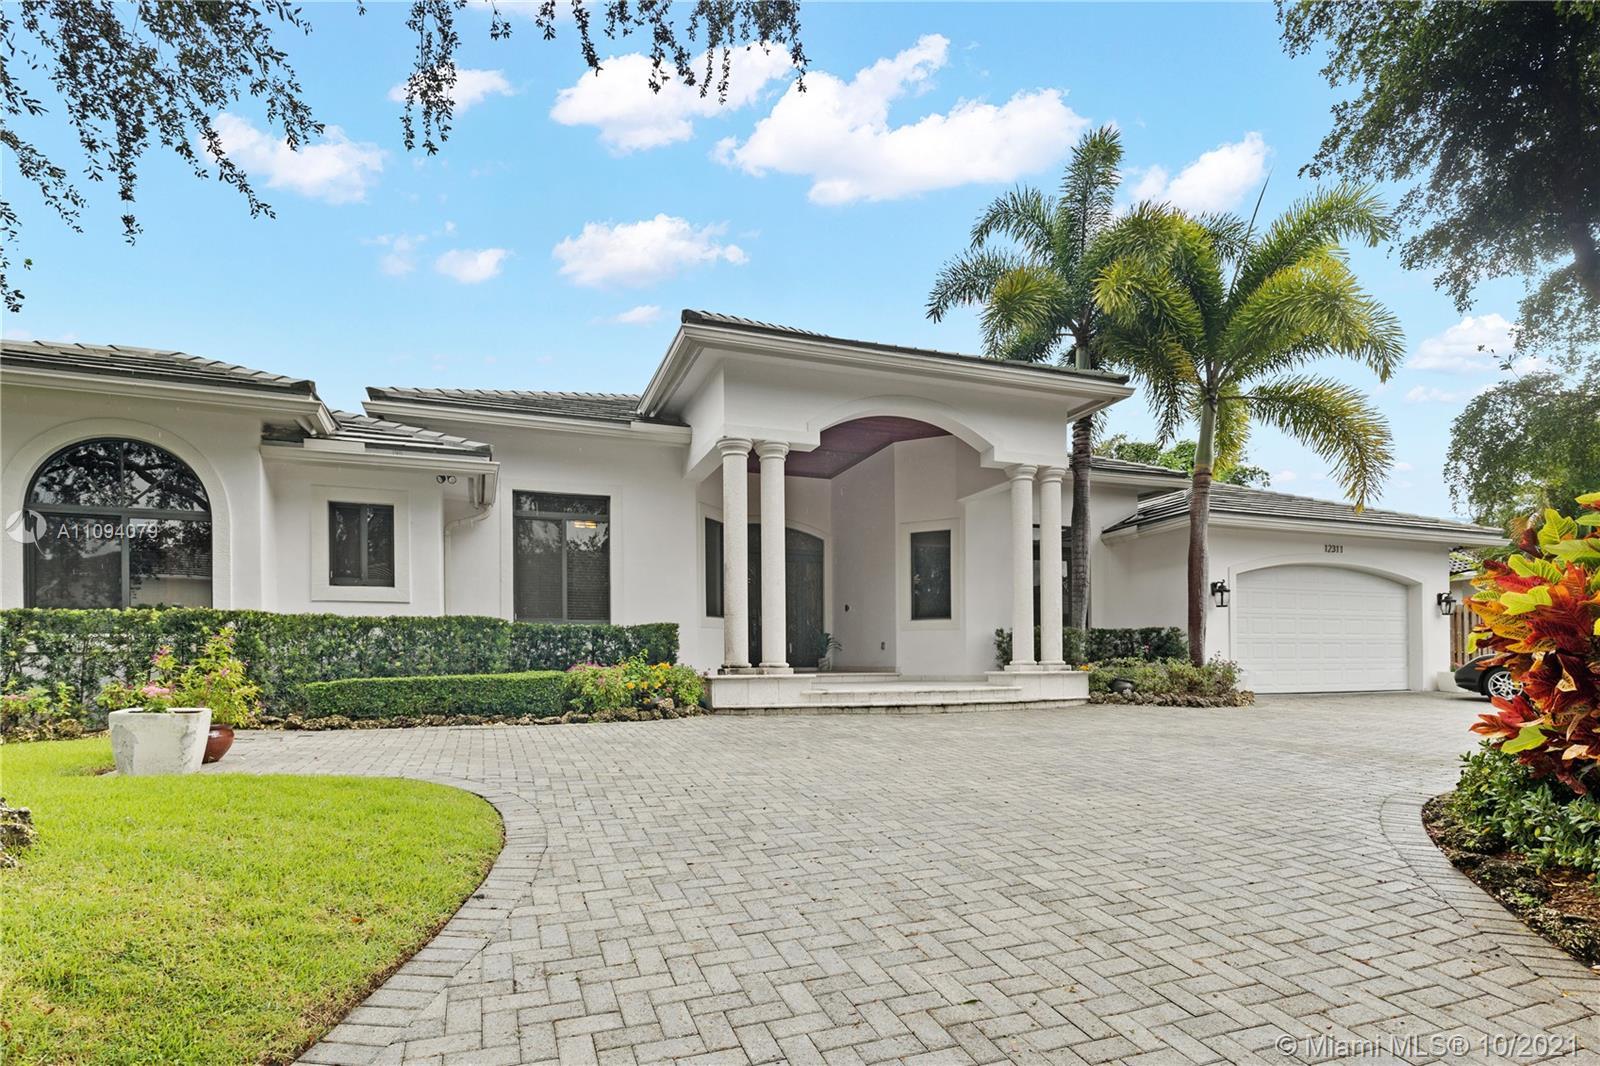 Oak Ridge Falls - 12311 SW 94th Ave, Miami, FL 33176